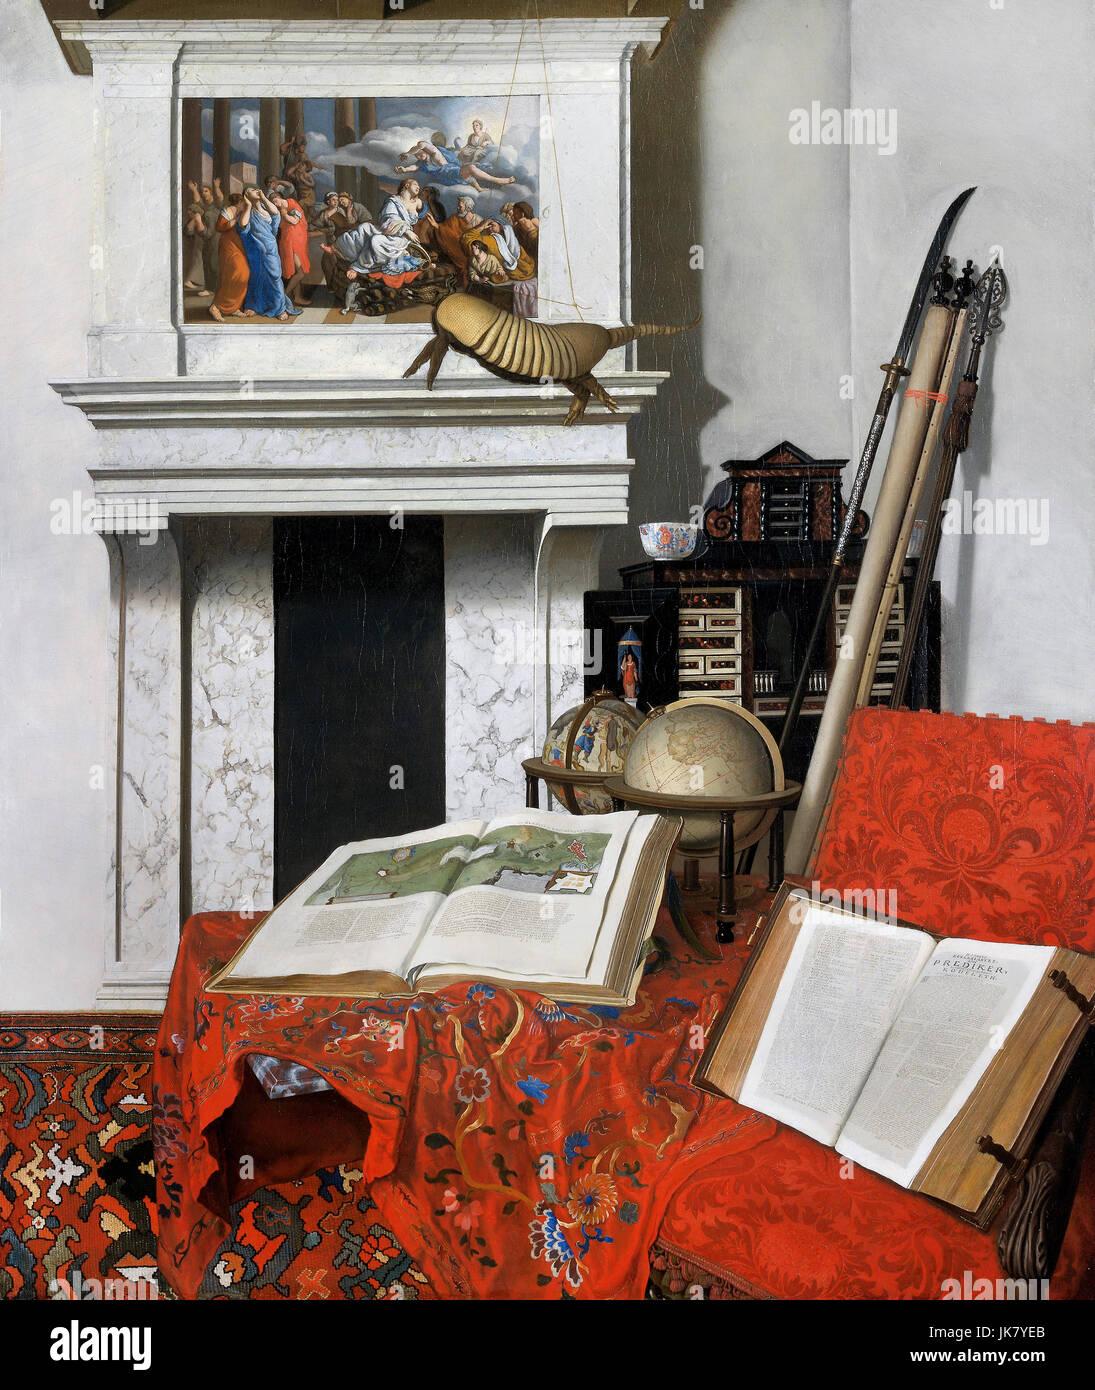 Jan van der Heyden, Room Corner with Curiosities 1712 Oil on canvas. Museum of Fine Arts, Budapest, Hungary. - Stock Image